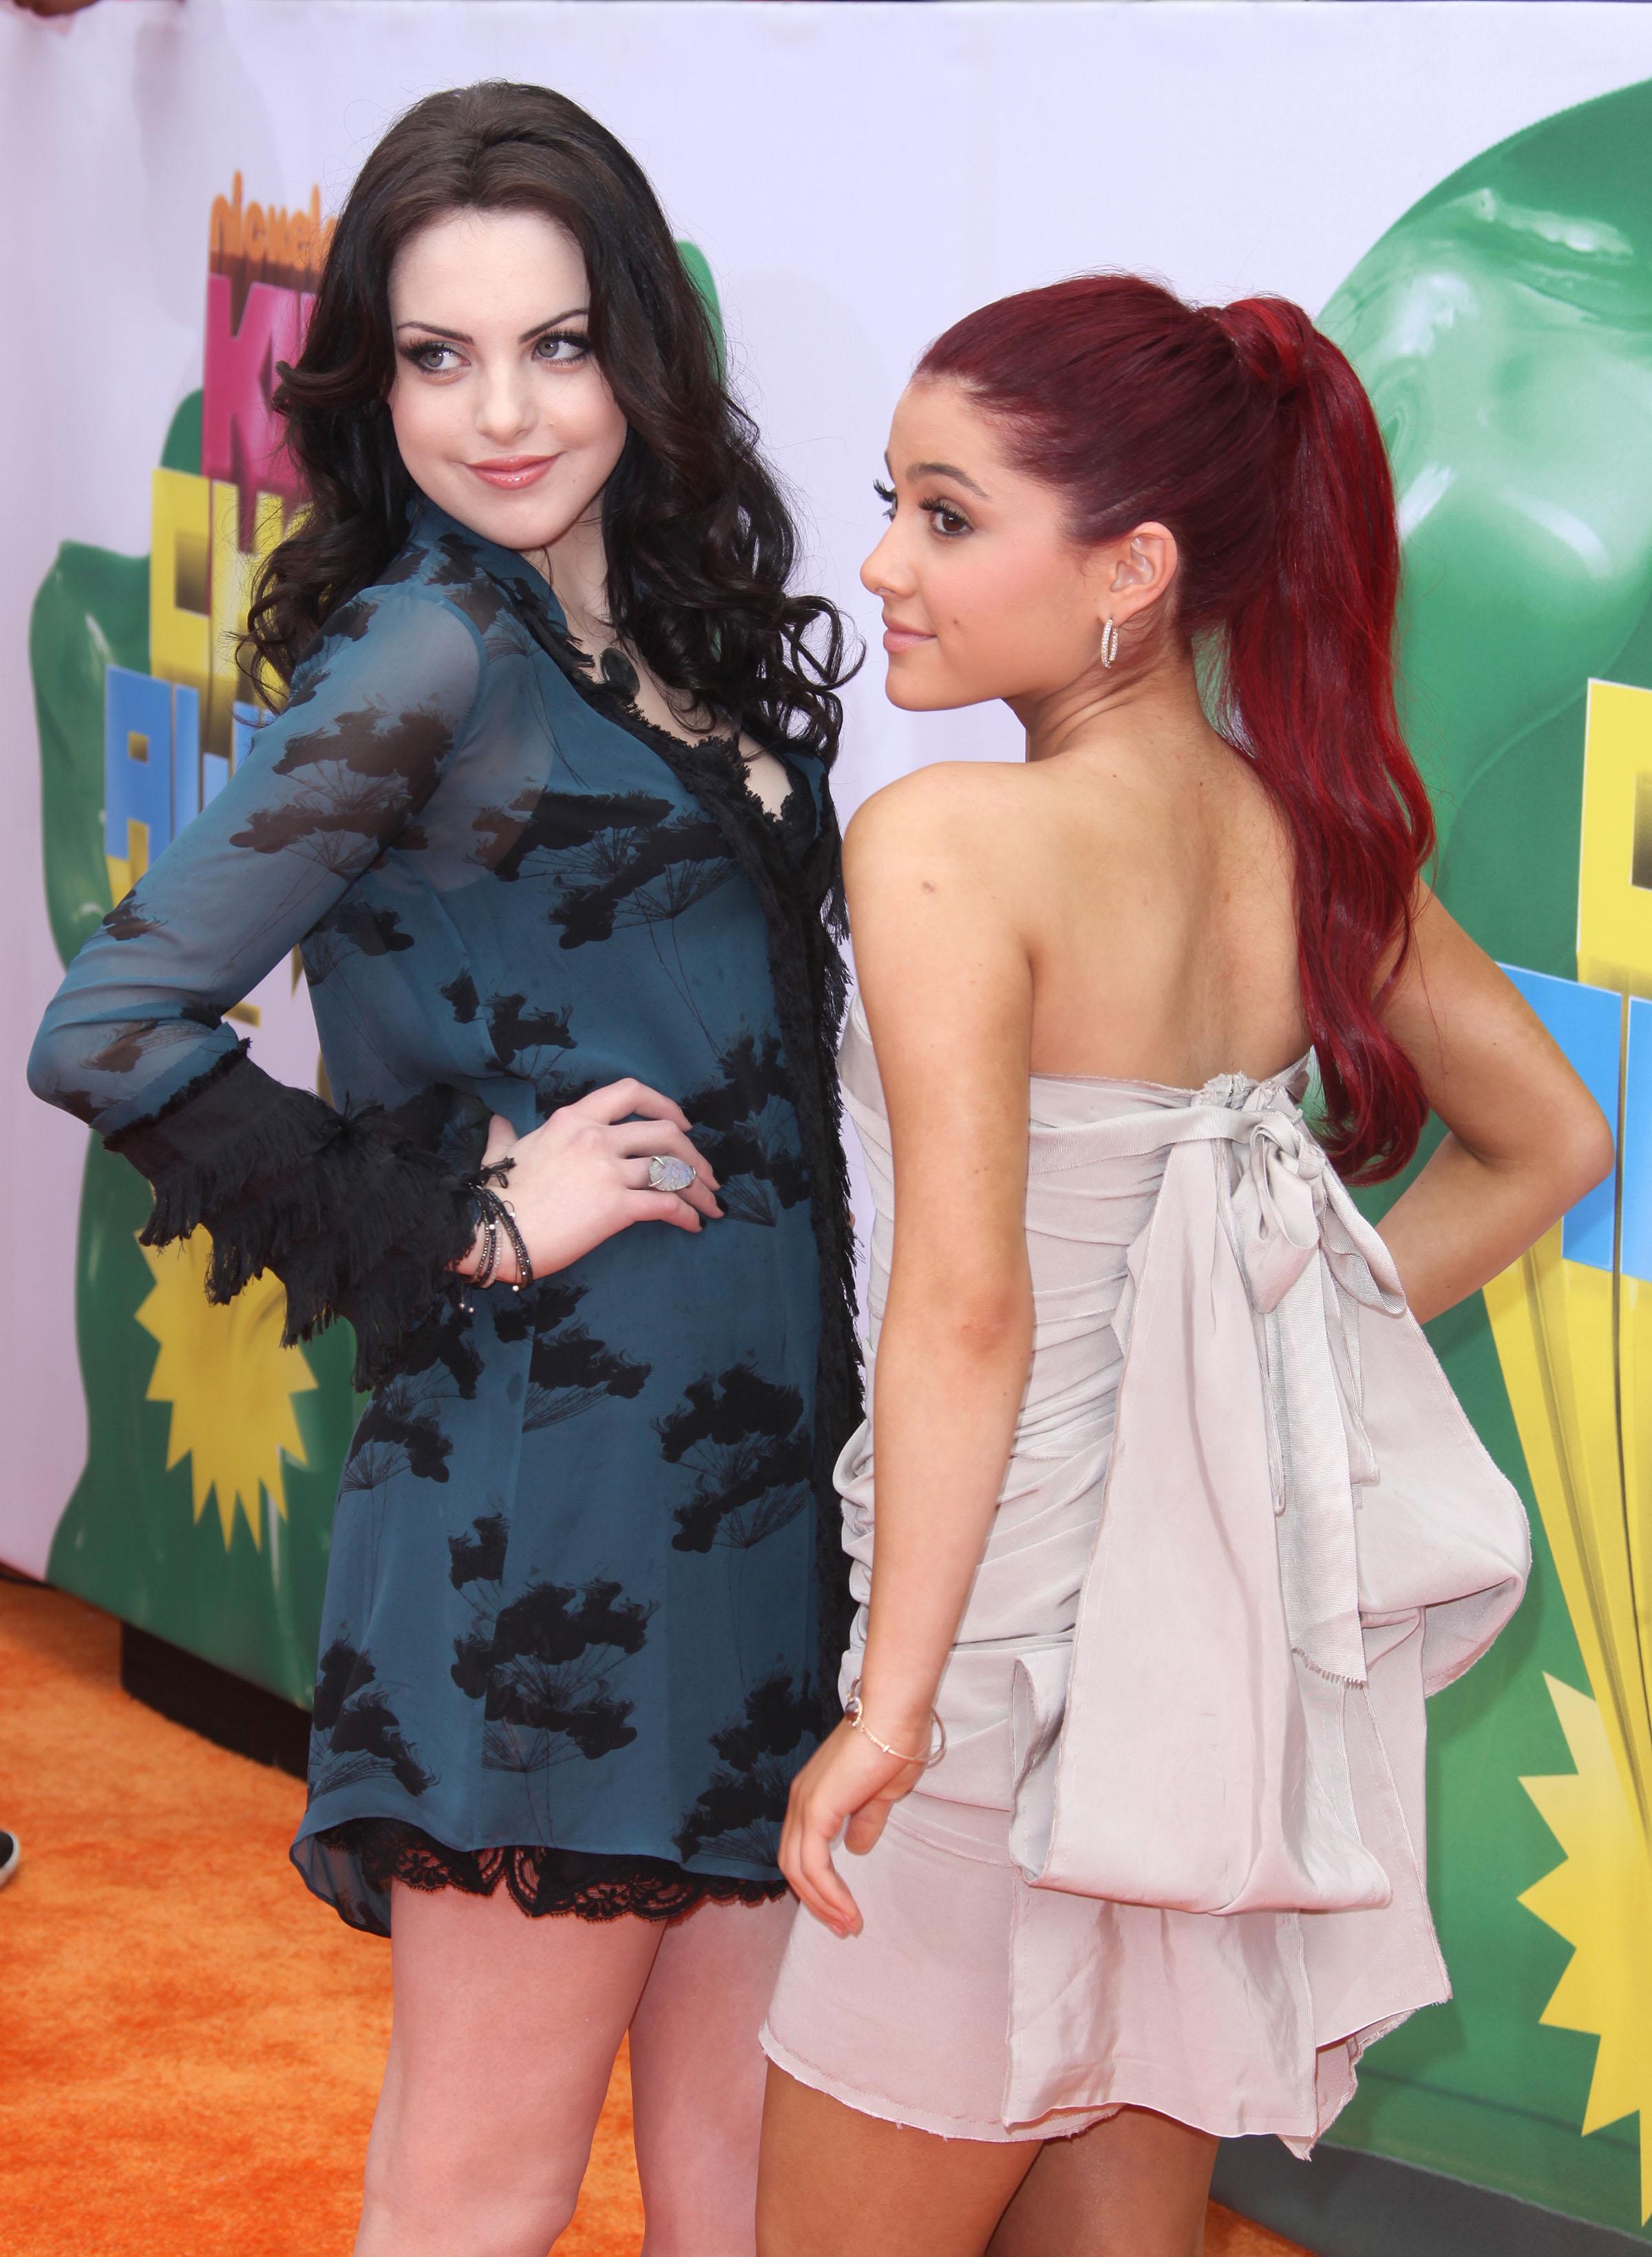 ariana grande and elizabeth